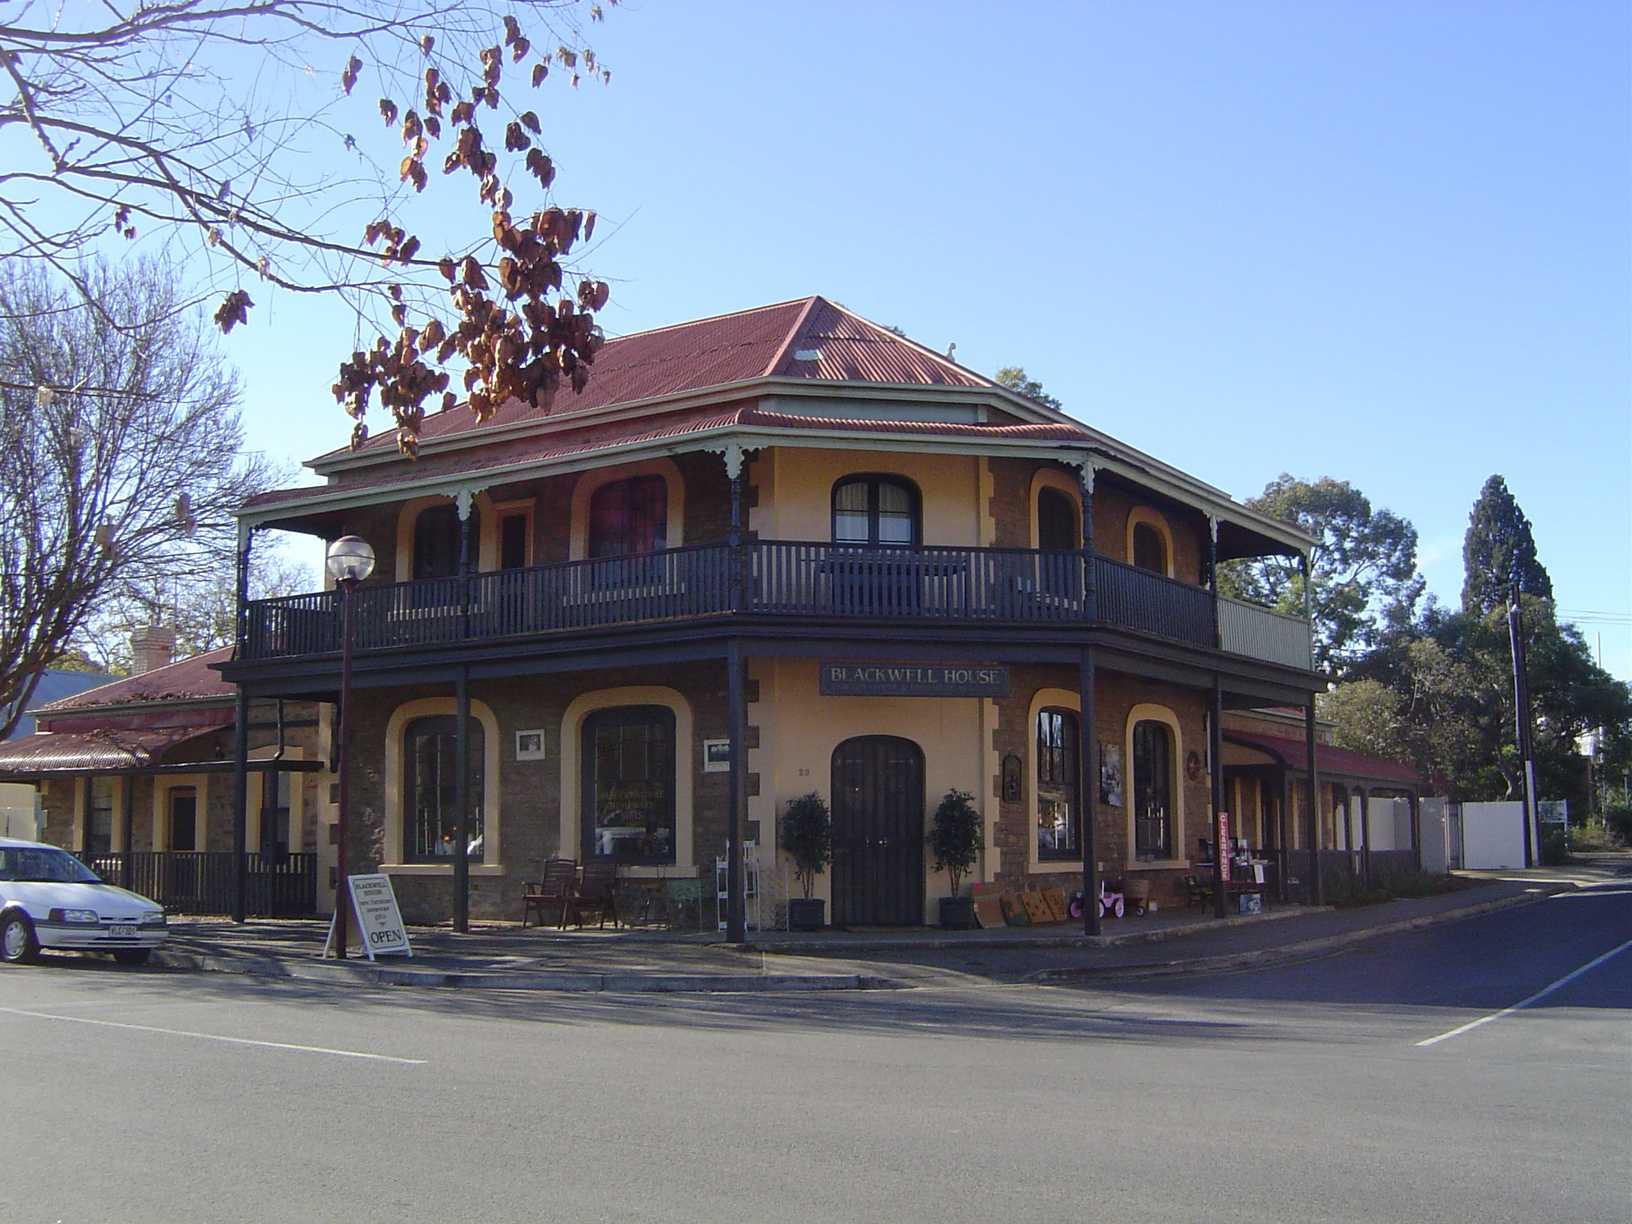 Strathalbyn Australia  city photos gallery : ... House 1869 , Strathalbyn, Fleurieu Peninsula, South Australia